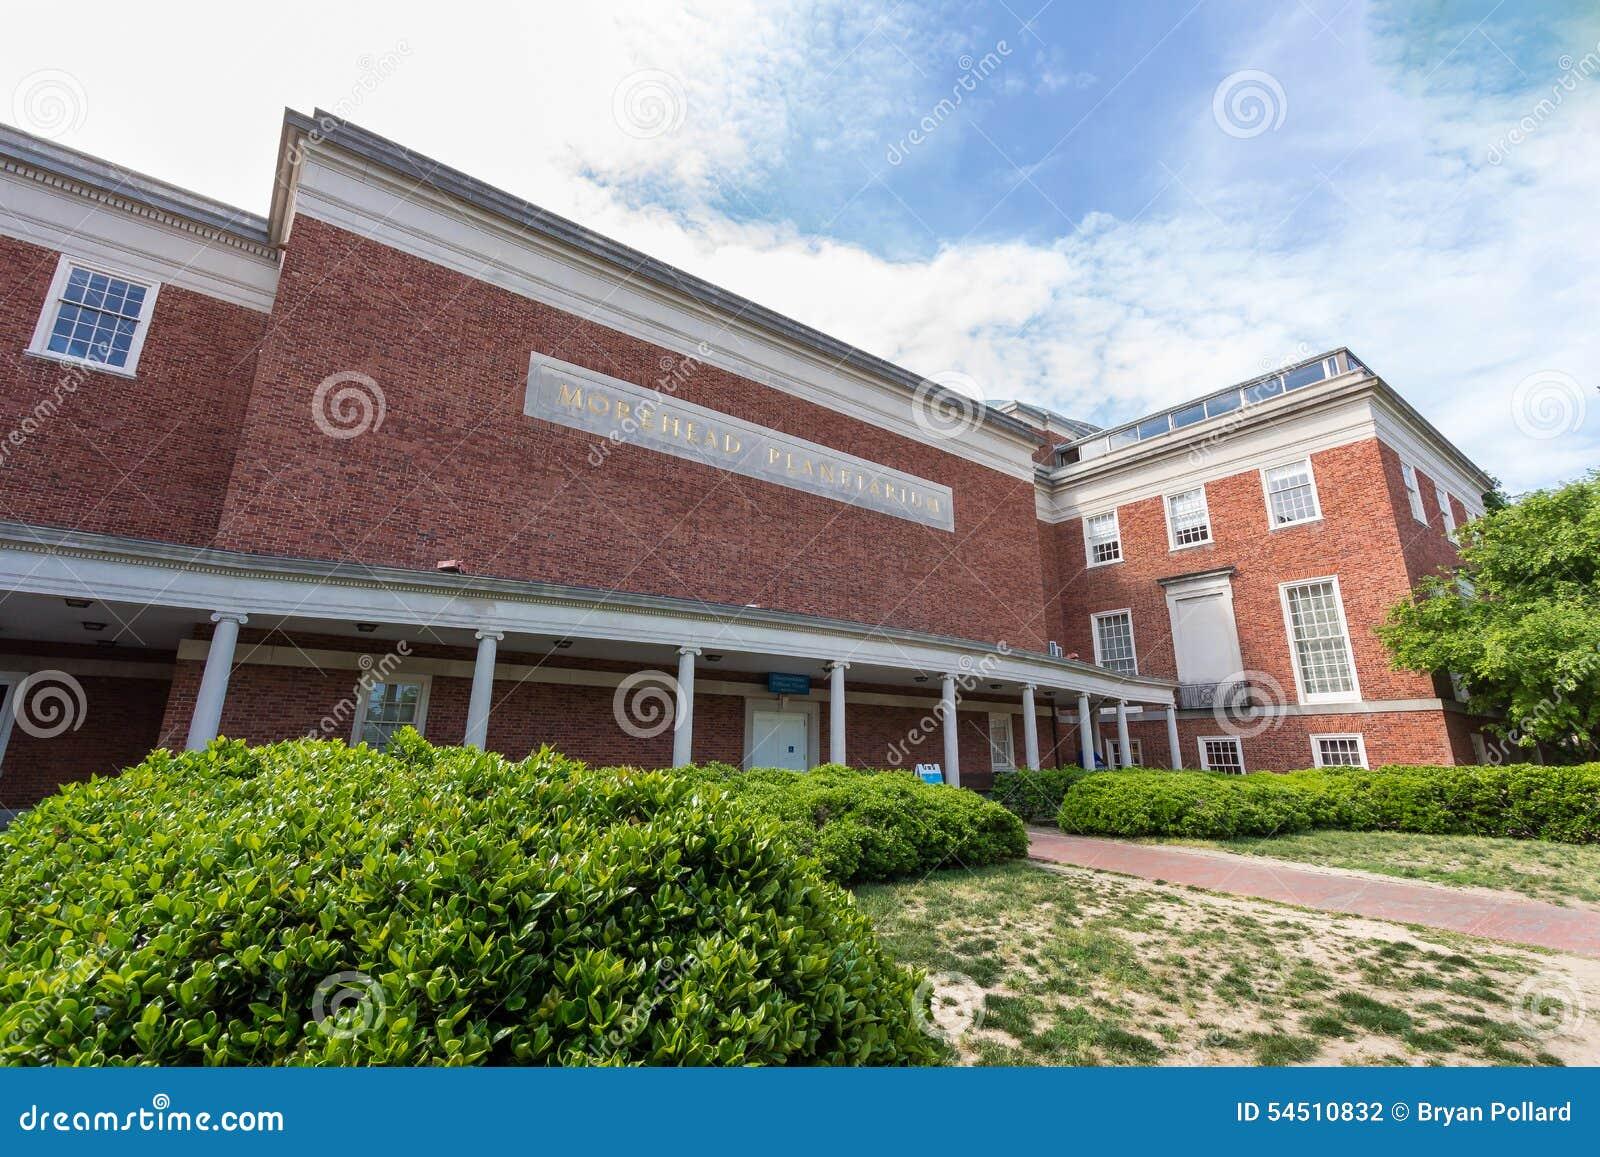 Morehead Planetarium At UNC-Chapel Hill Editorial